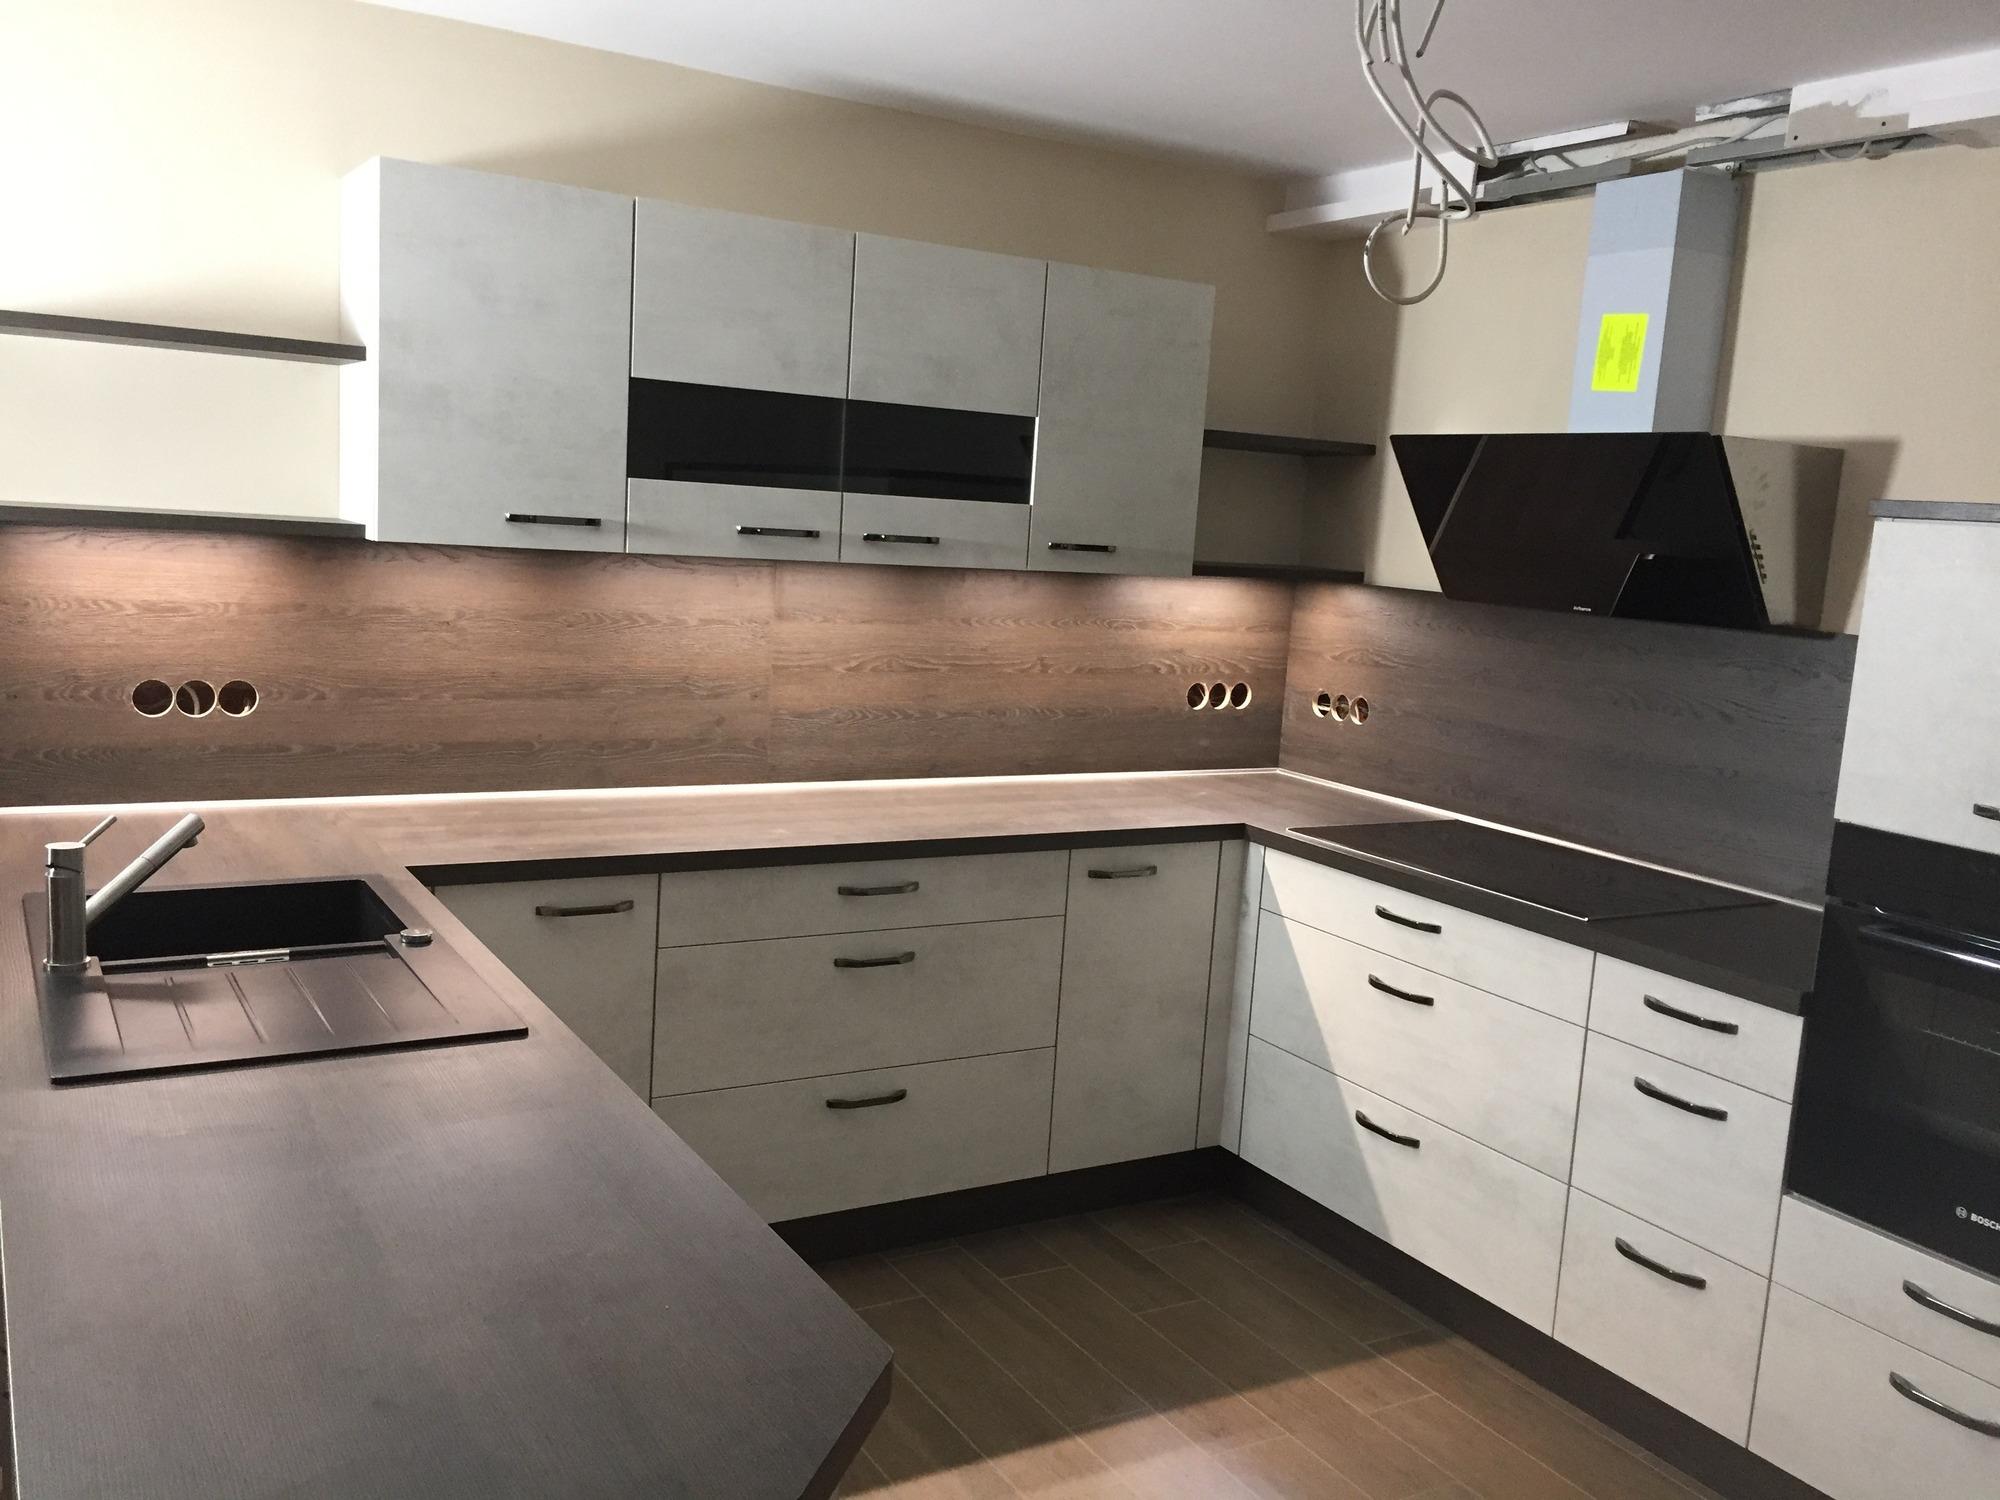 großzügige offene küche in betonoptik - gutsmann küchen